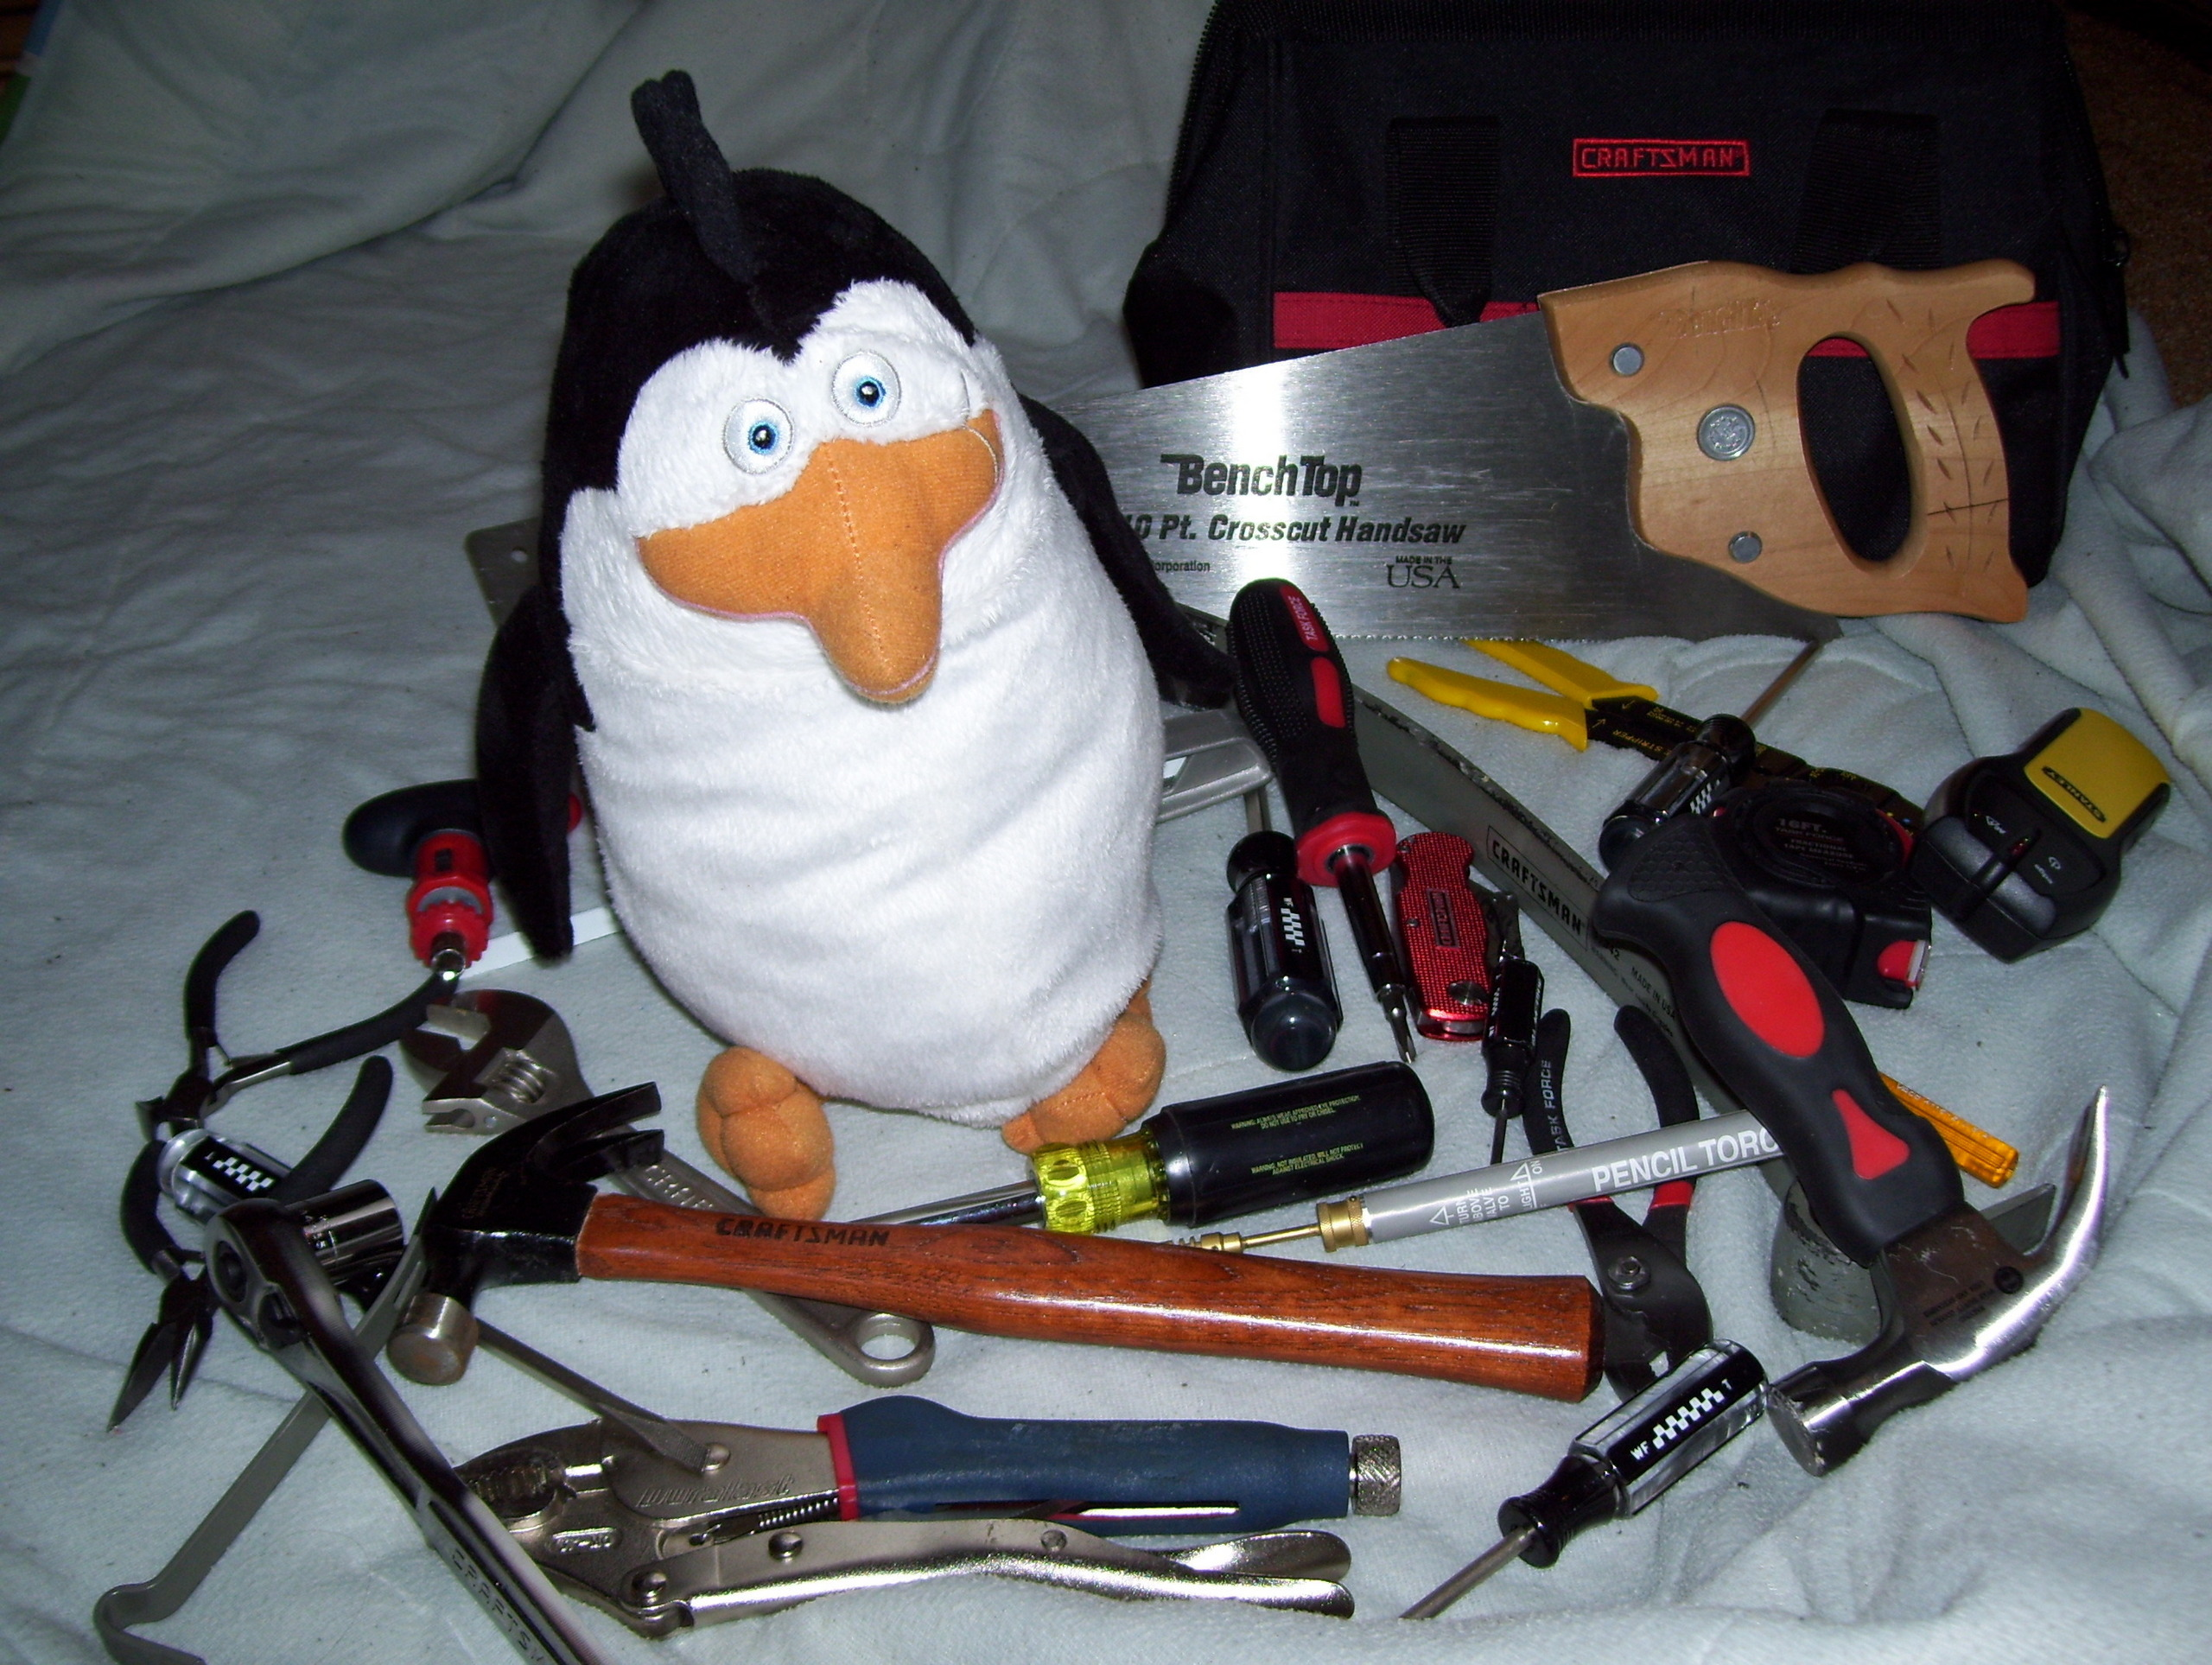 Rico and His Tools